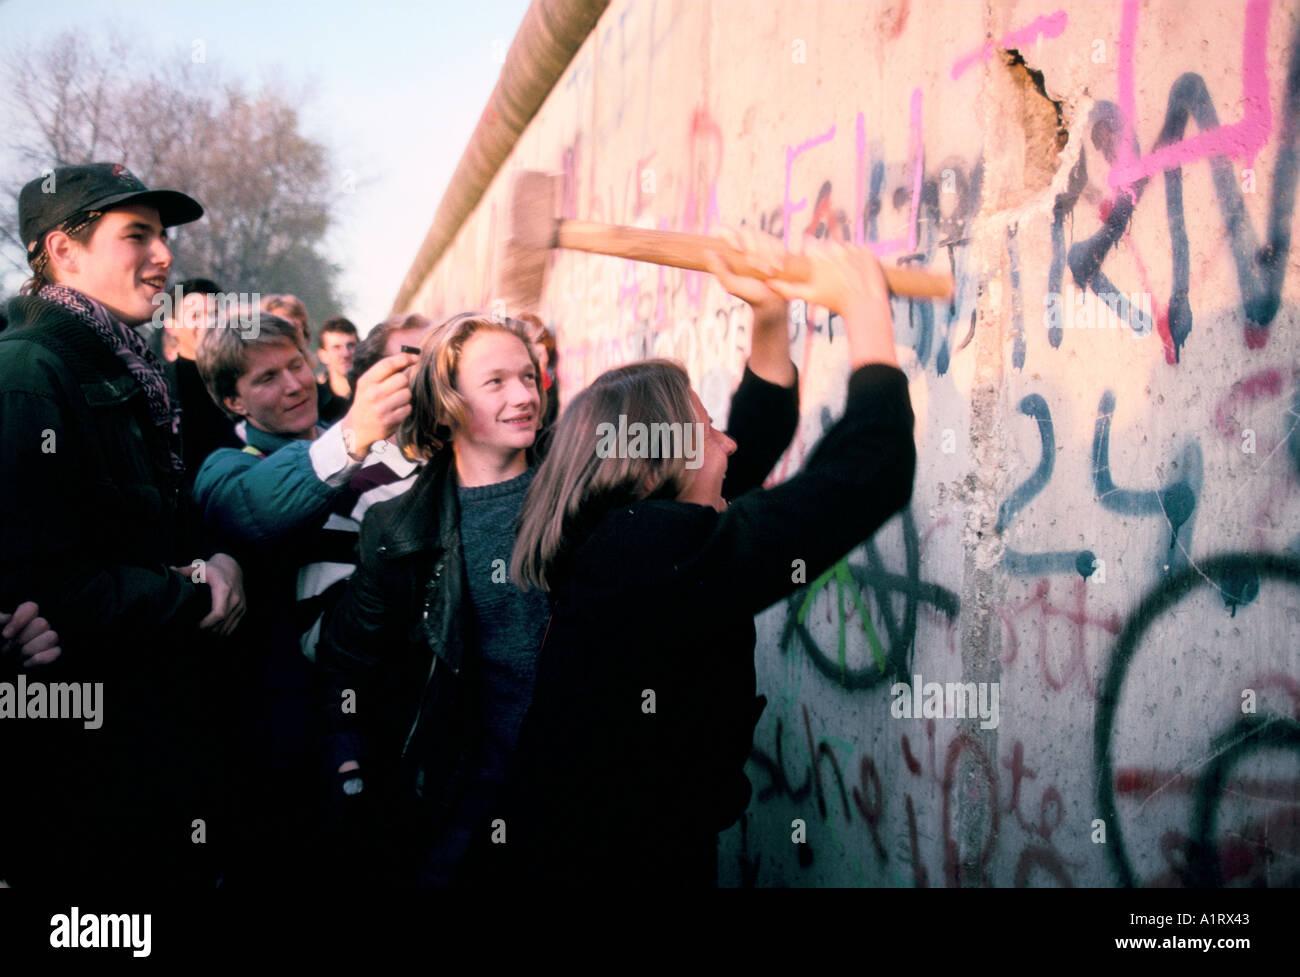 Chute DU MUR DE BERLIN Berlin Allemagne 1989 Photo Stock